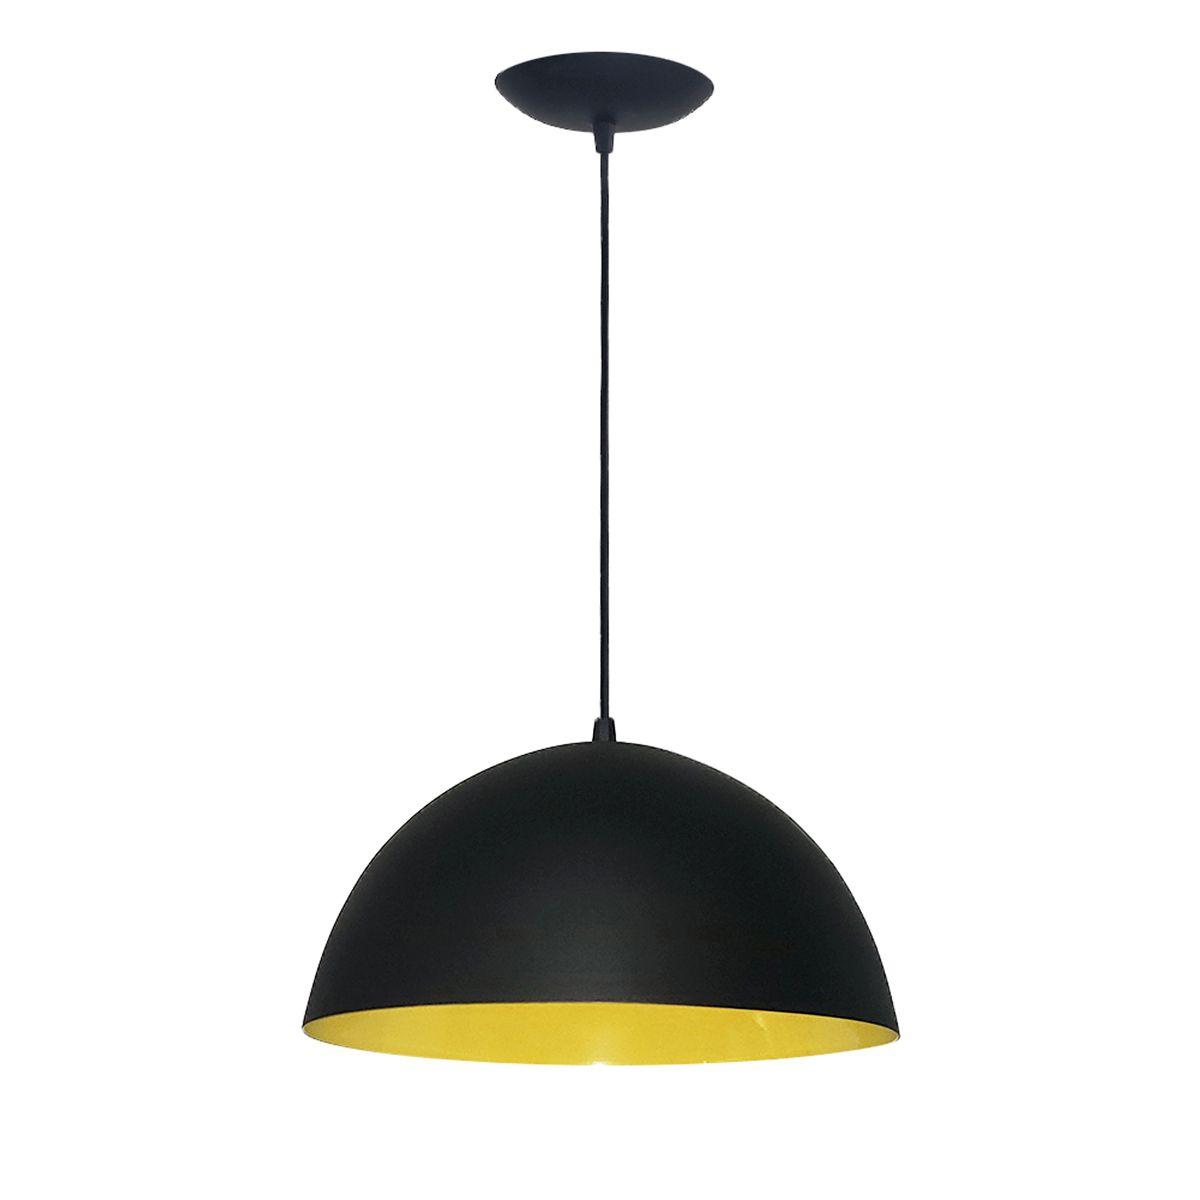 Luminária Decorativa Meia Esfera 30 Preto/Amarelo Pendente